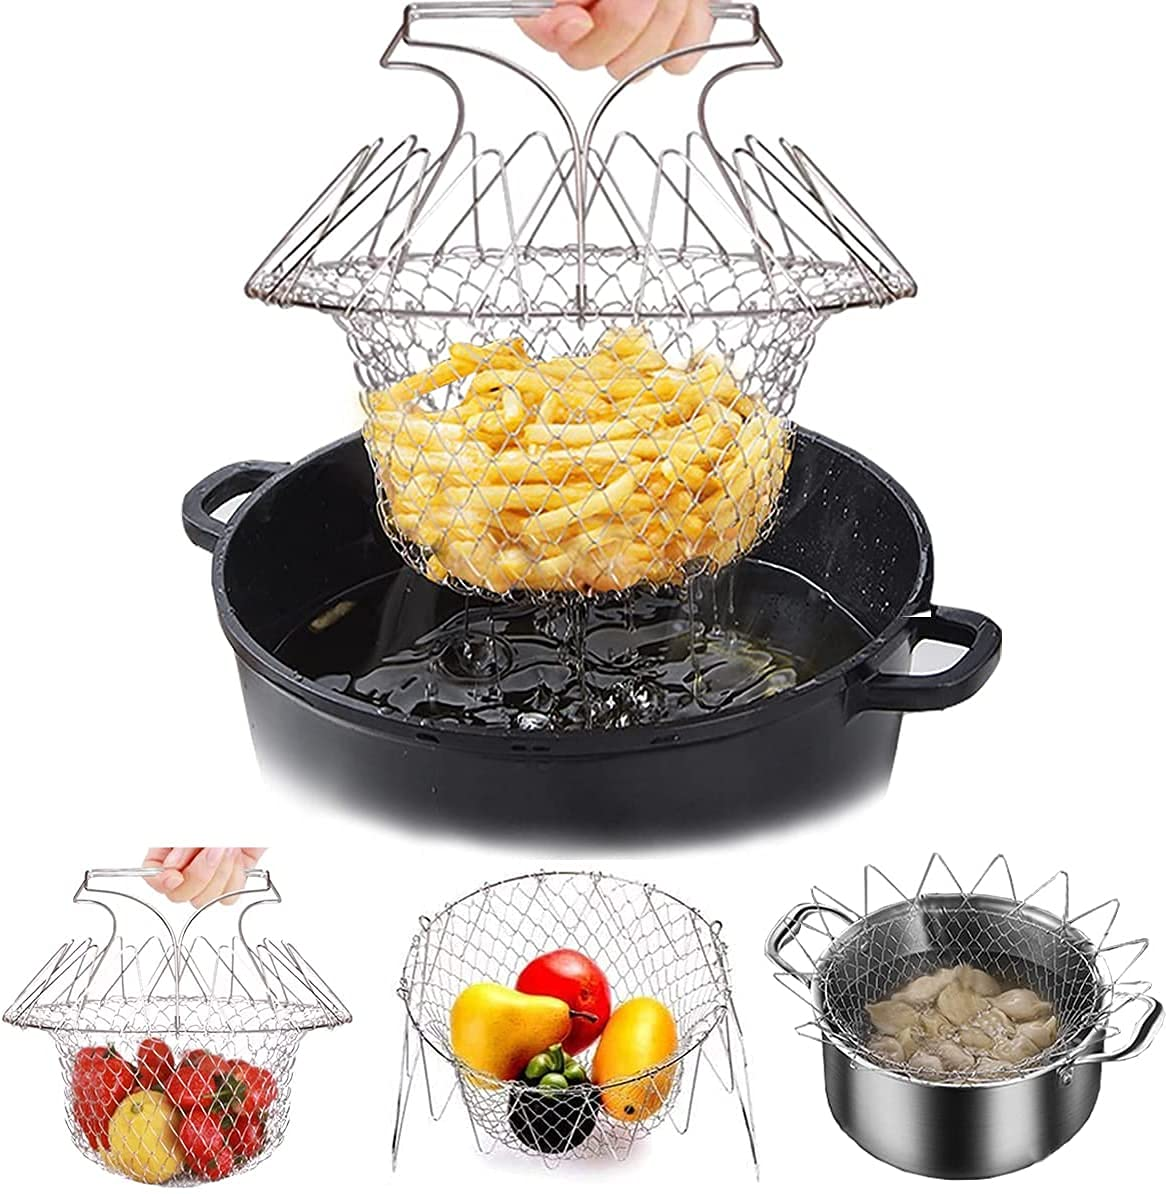 KOUZZINA Multi-Function Stainless SteelFoldable Fry Basket   Chef Basket   Poaching Boiling Deep Frying Basket   Fruit Vegetable Rinsing Washing...